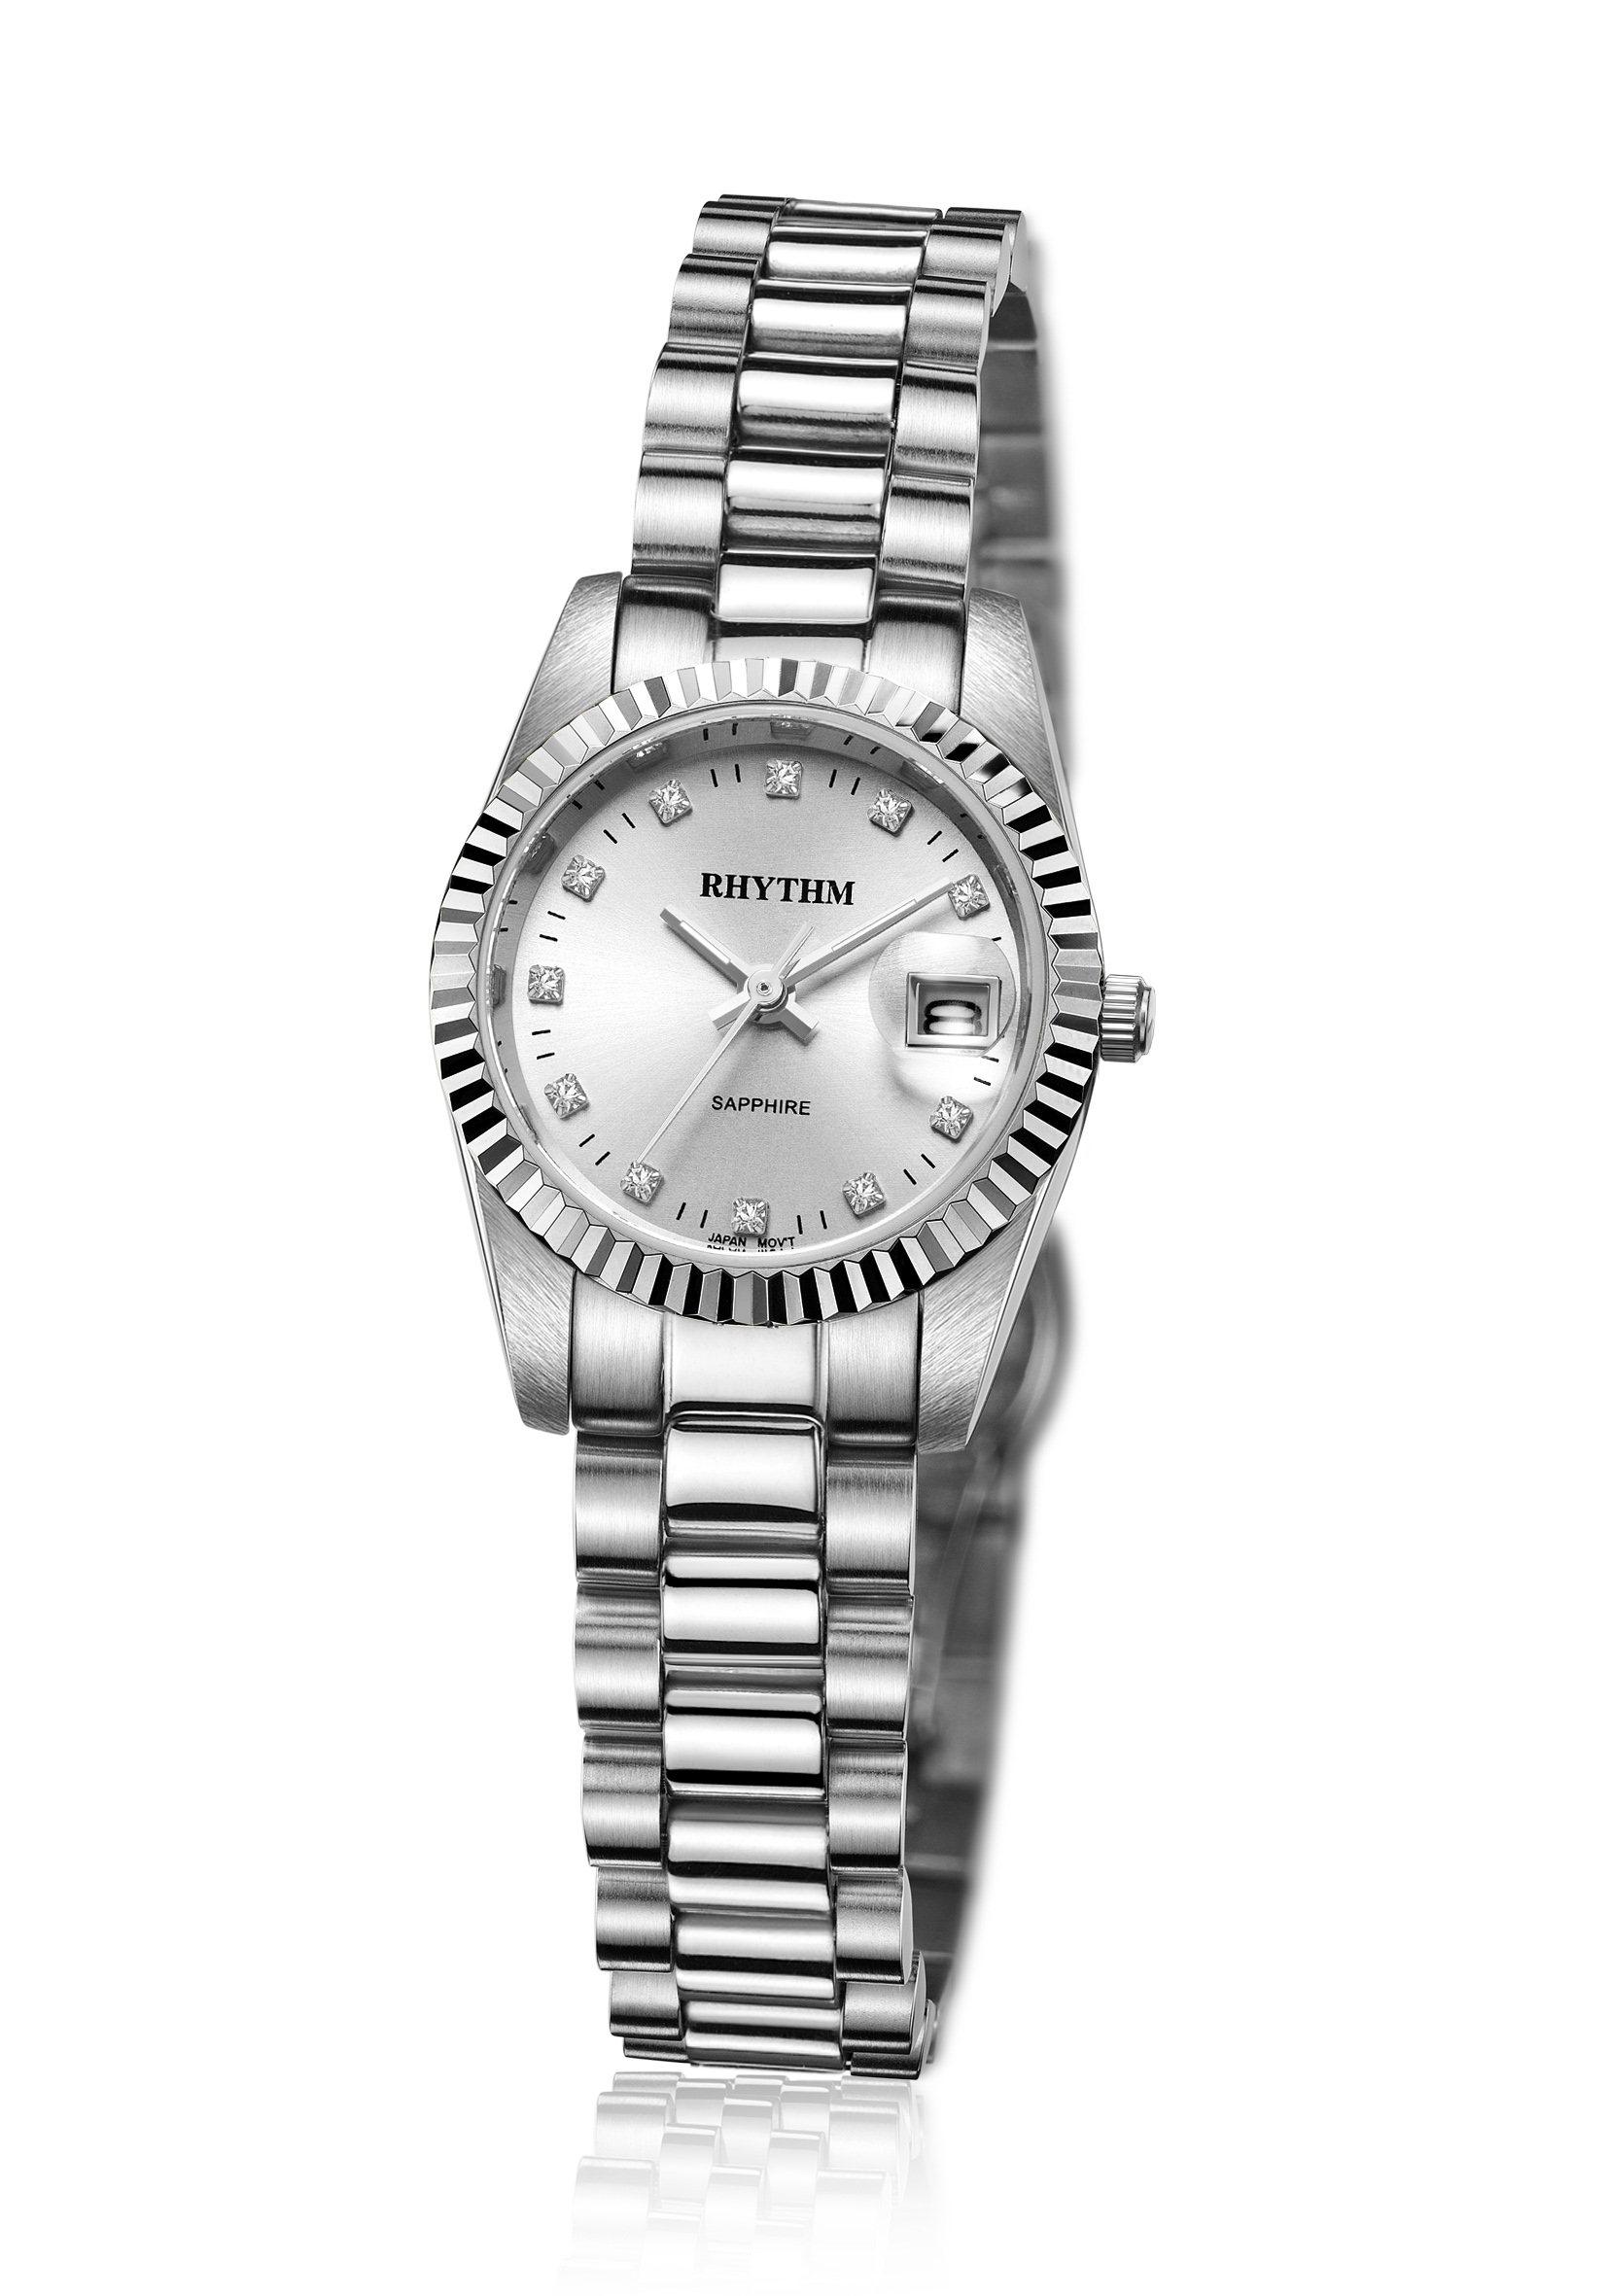 Rhythm Traditional Collection R1204s 01 Jam Tangan Wanita Daftar Global Timepiece Rq1611s 07 Pria Silver Putih R1202s Man